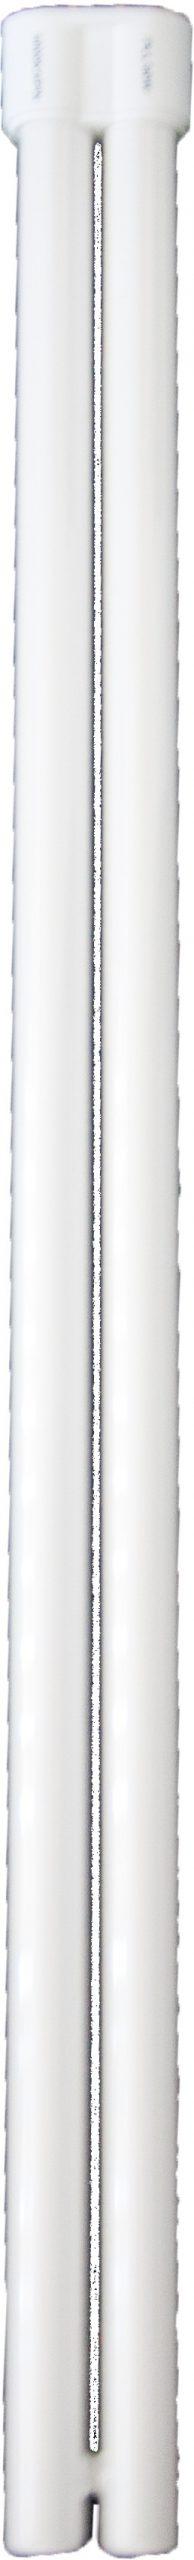 TL-lamp (coolwhite) t.b.v. CFL armatuur